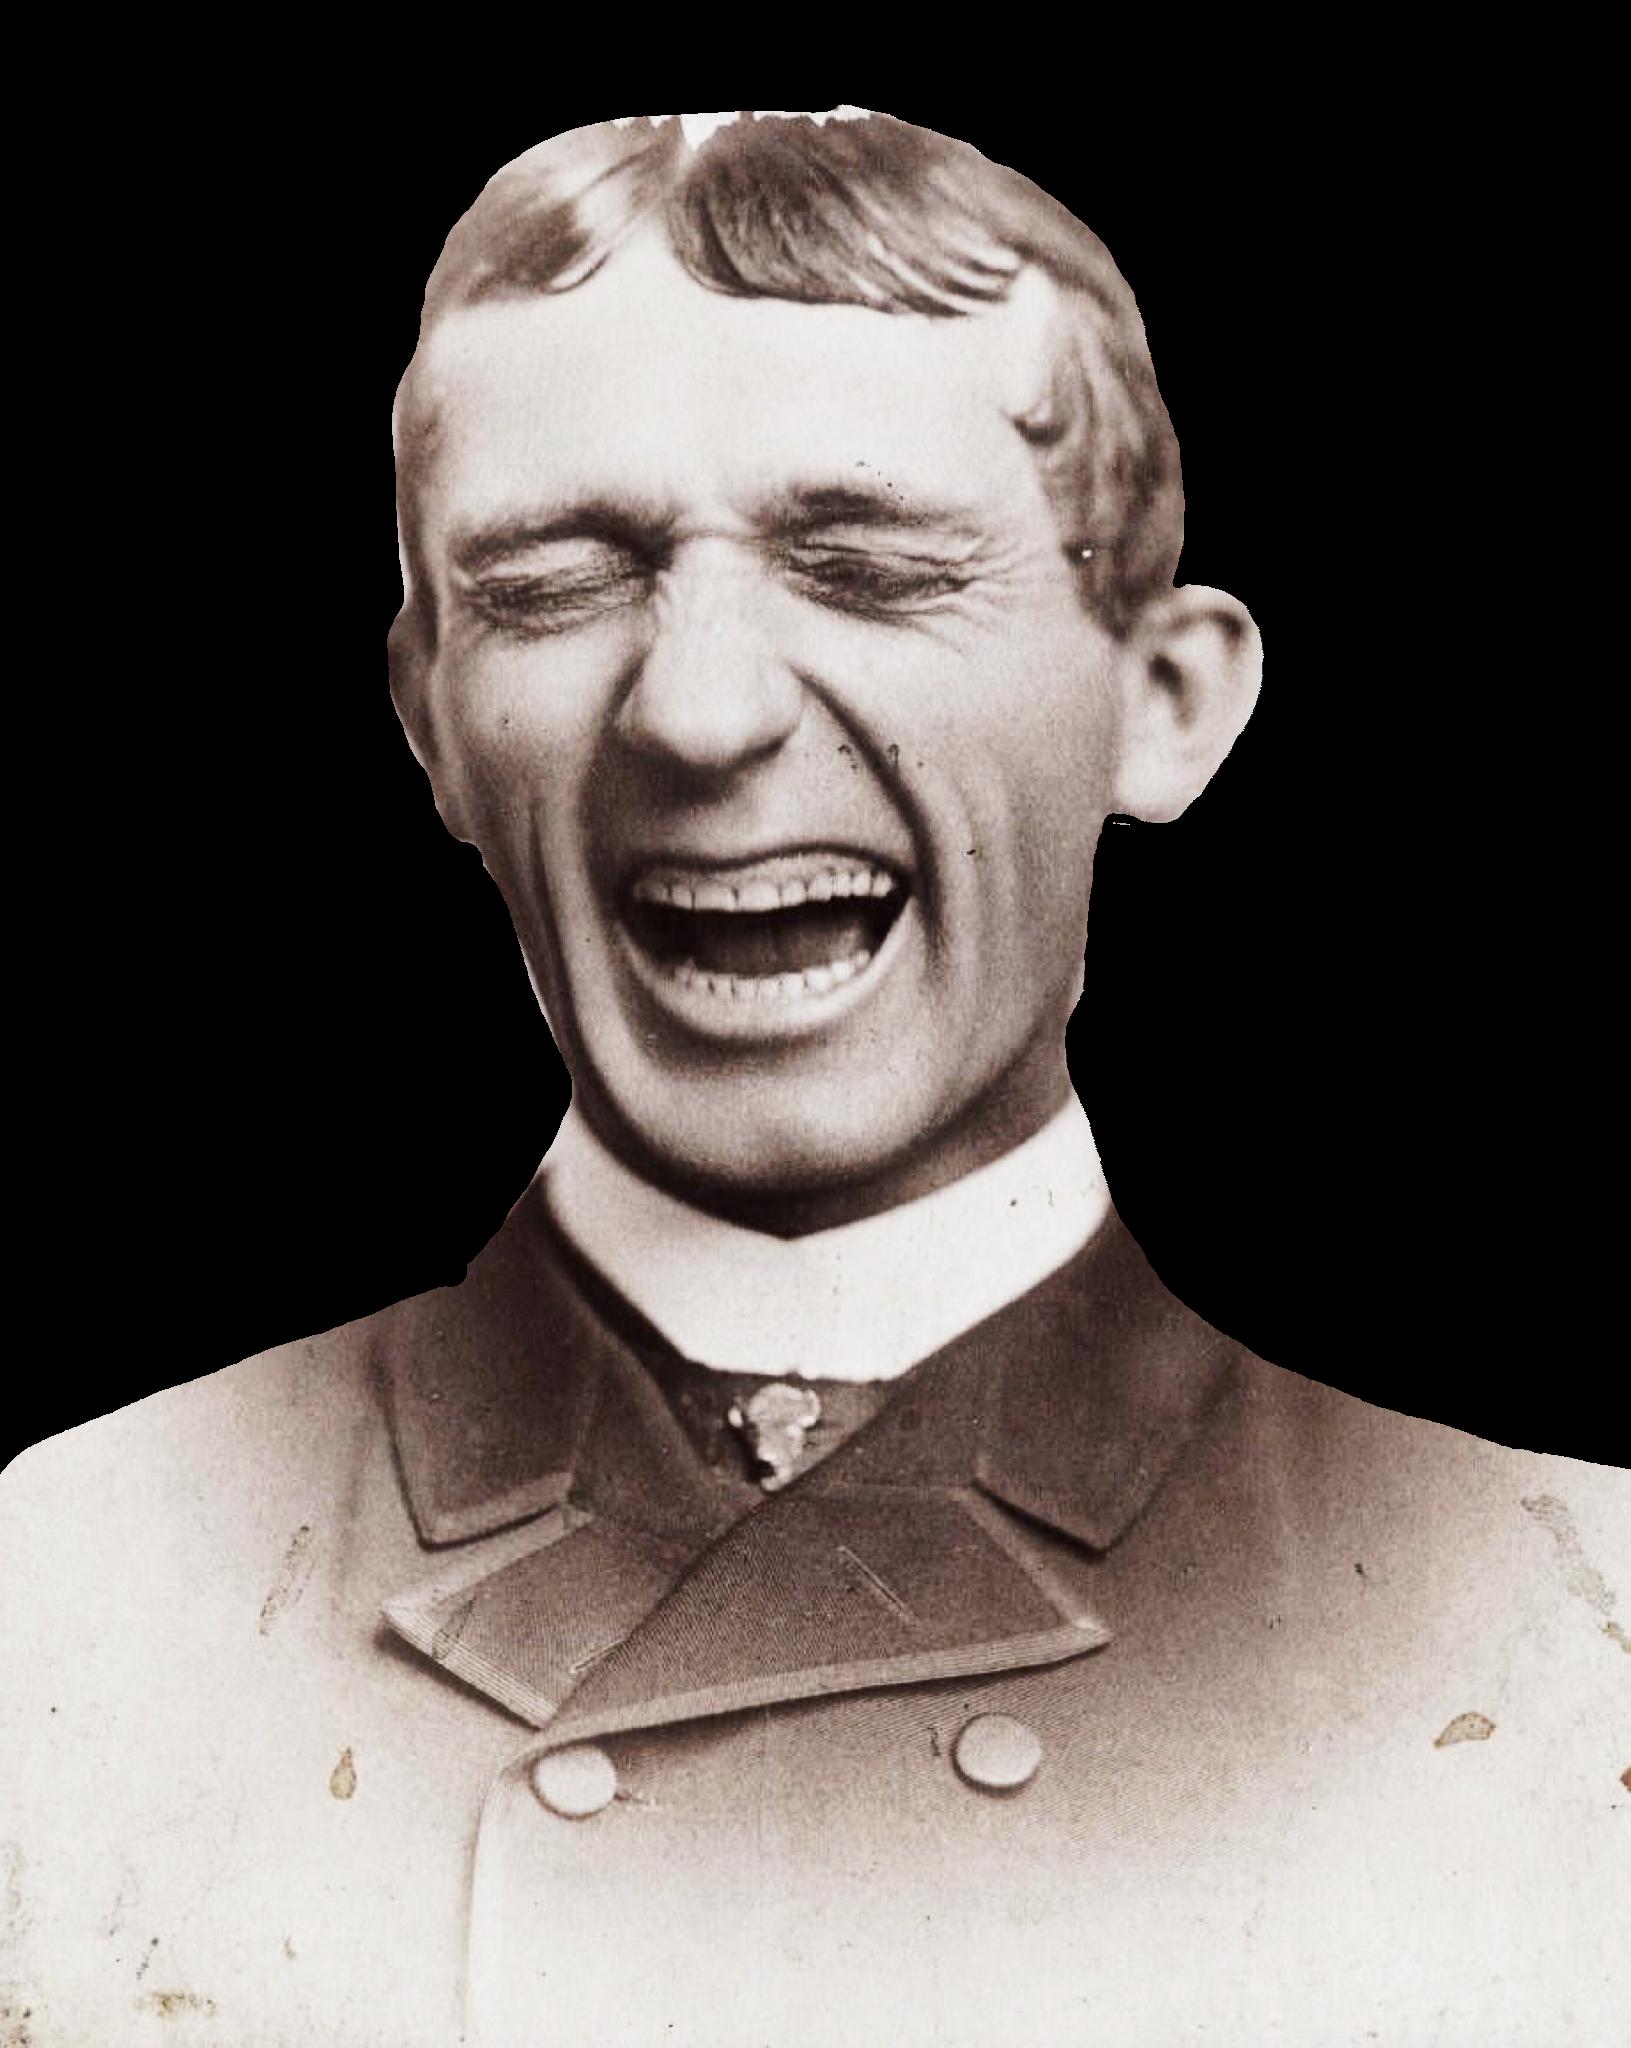 Vintage Laughing Man Vintage Pictures Historical Figures Digital Collage